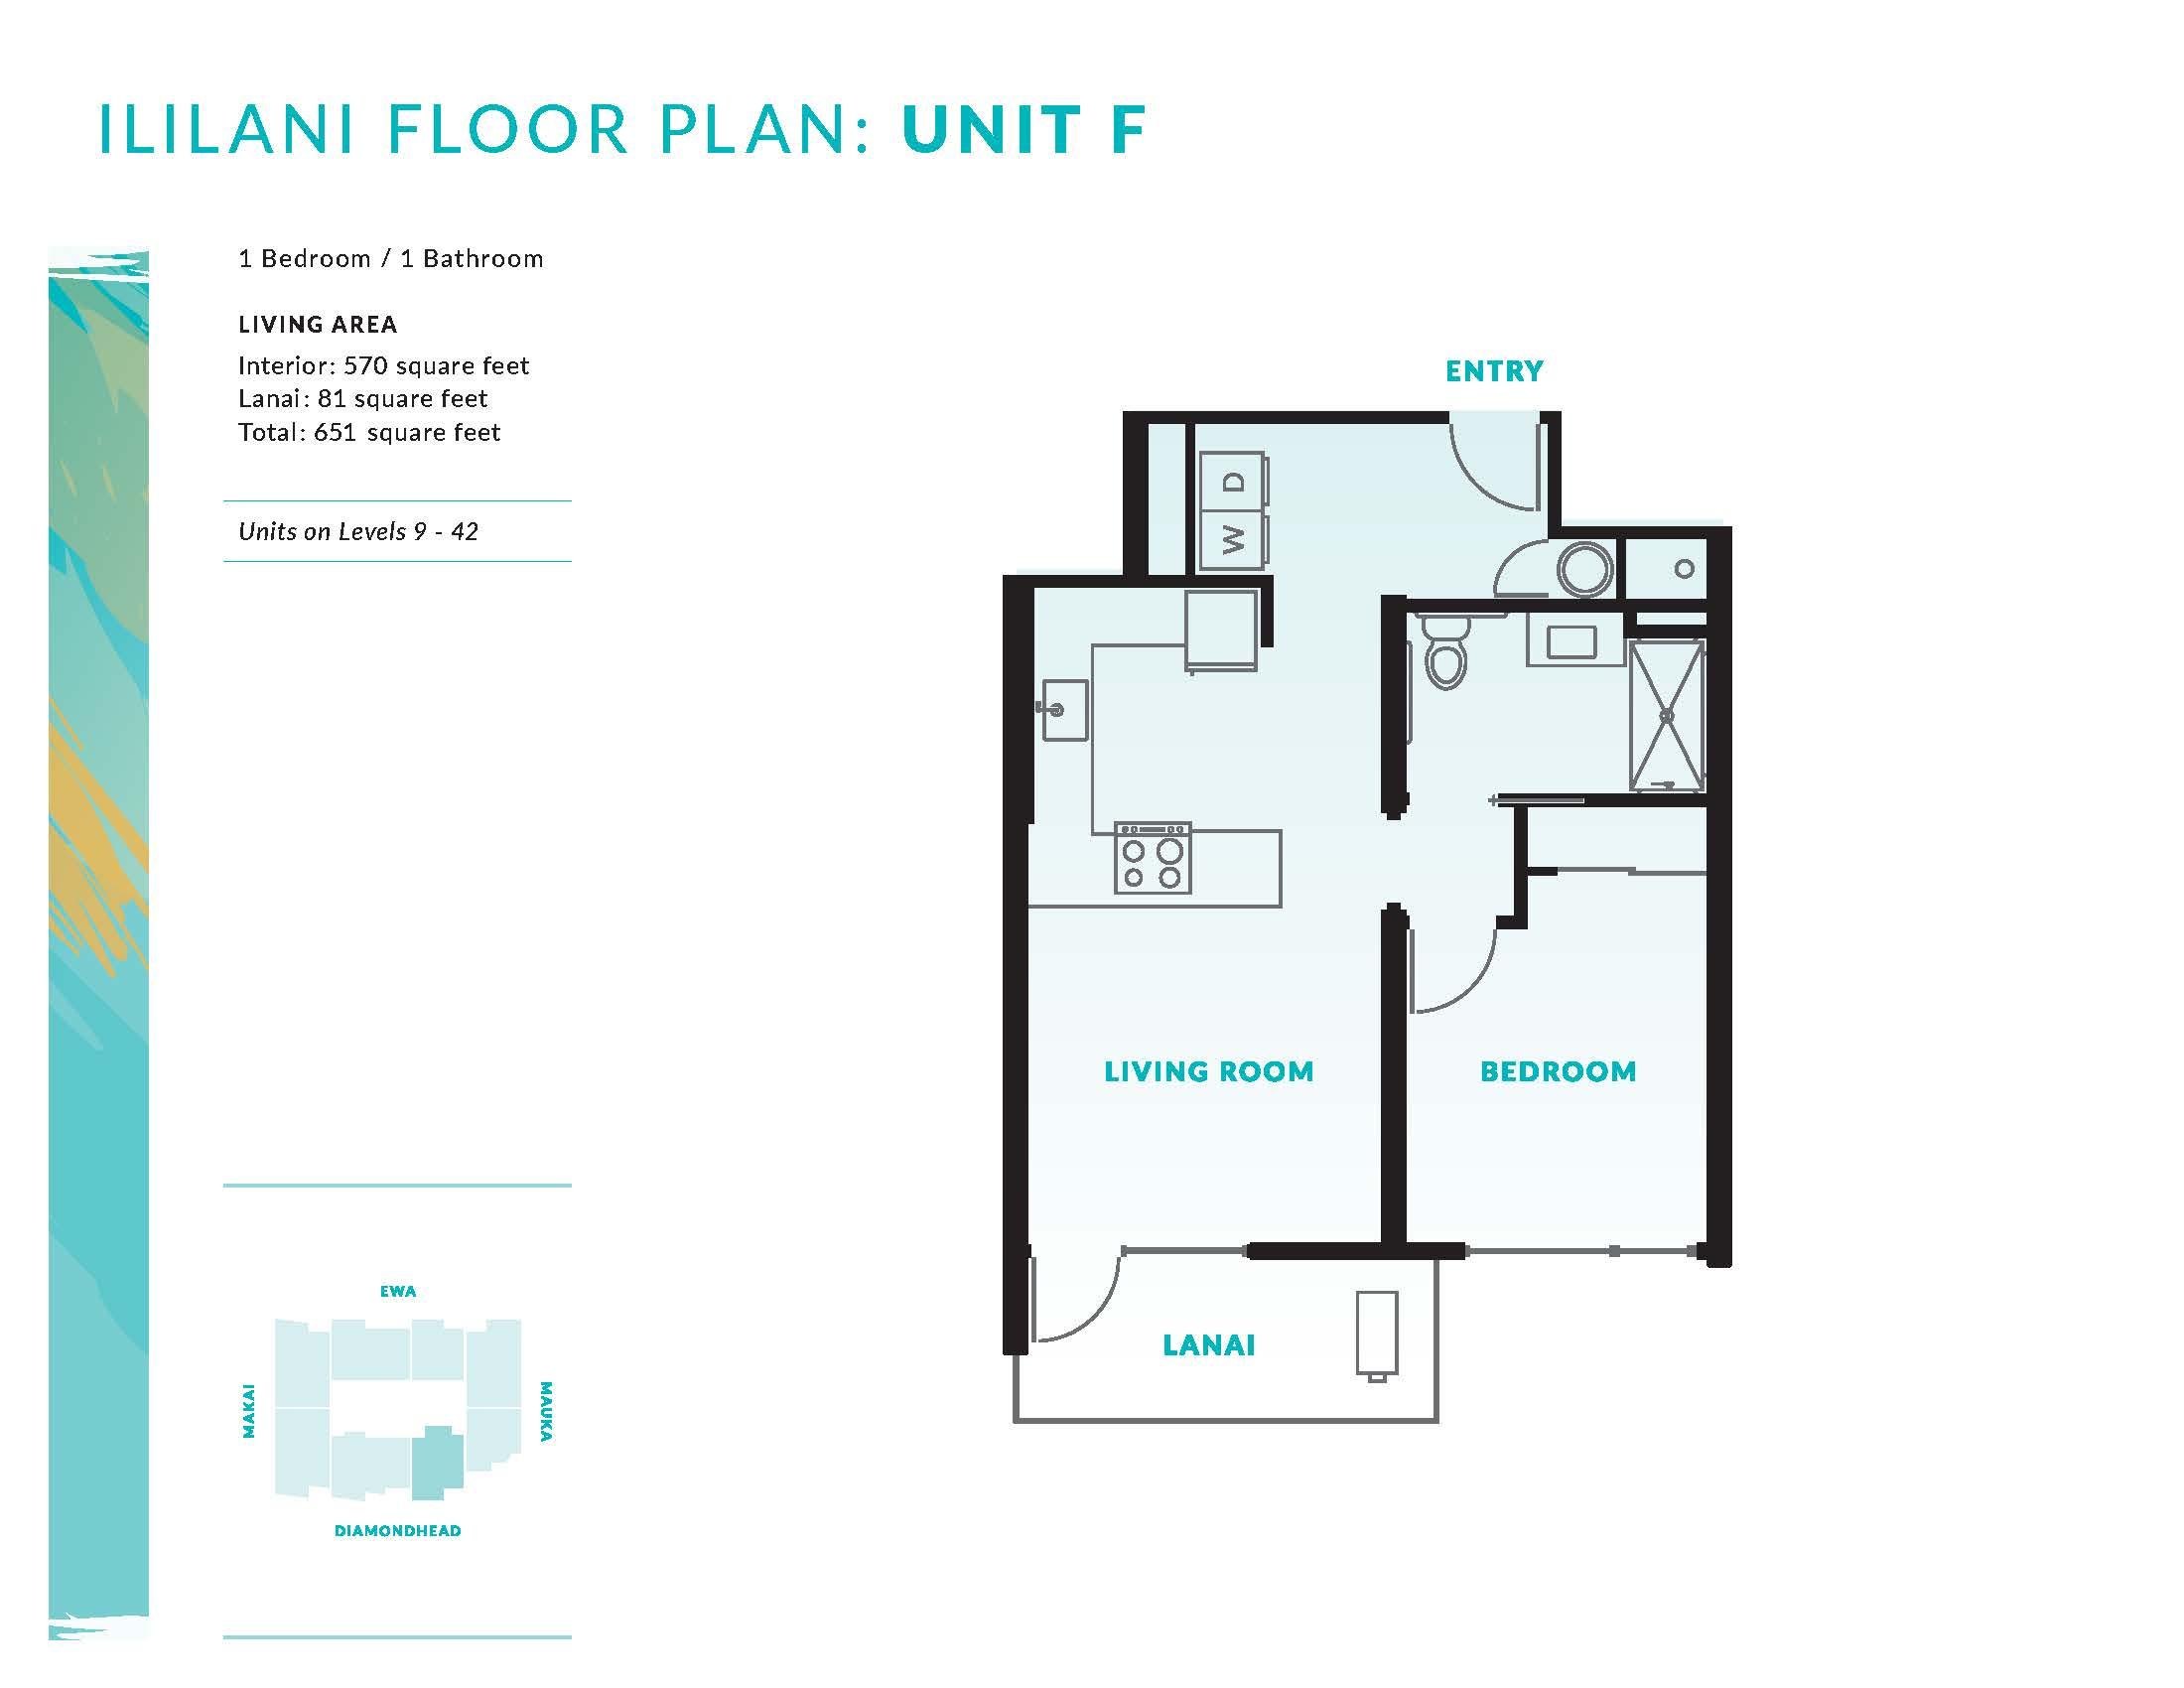 Ililani Floor Plan F